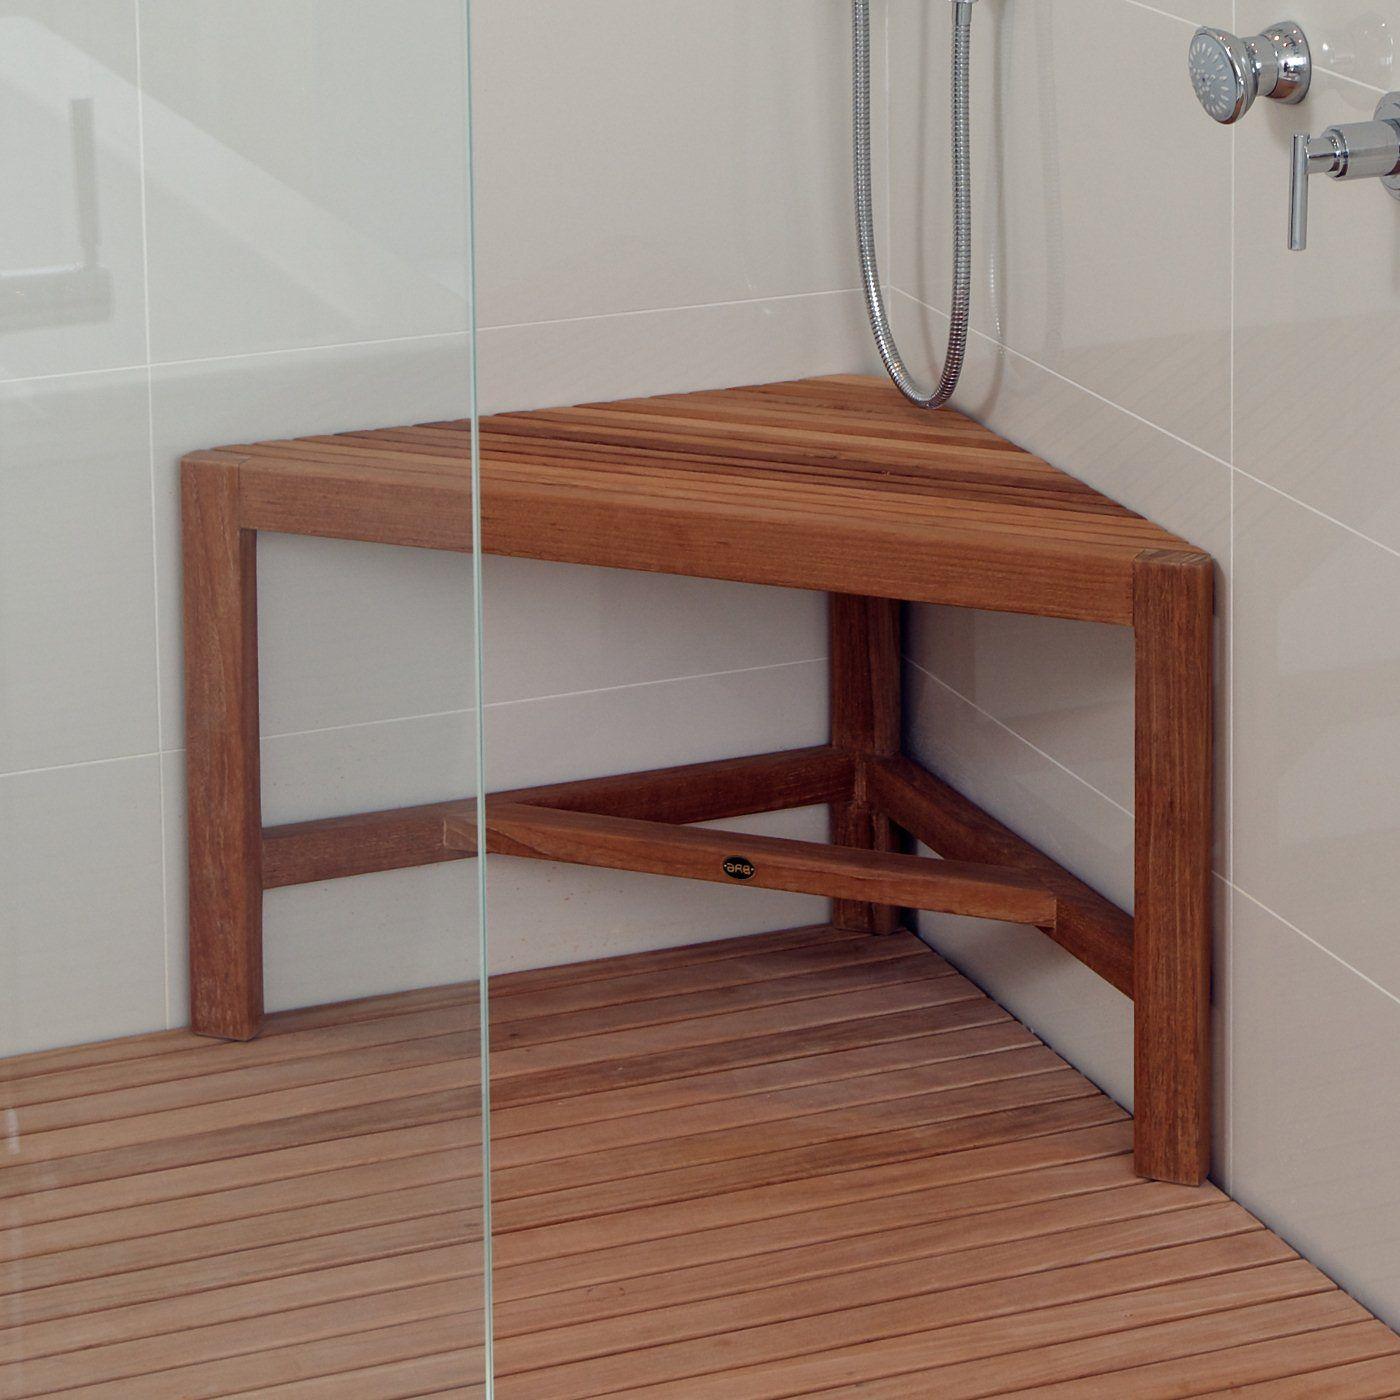 Arb Teak Specialties Ben529 Teak Corner Shower Bench Home Pinterest Shower Benches And Teak